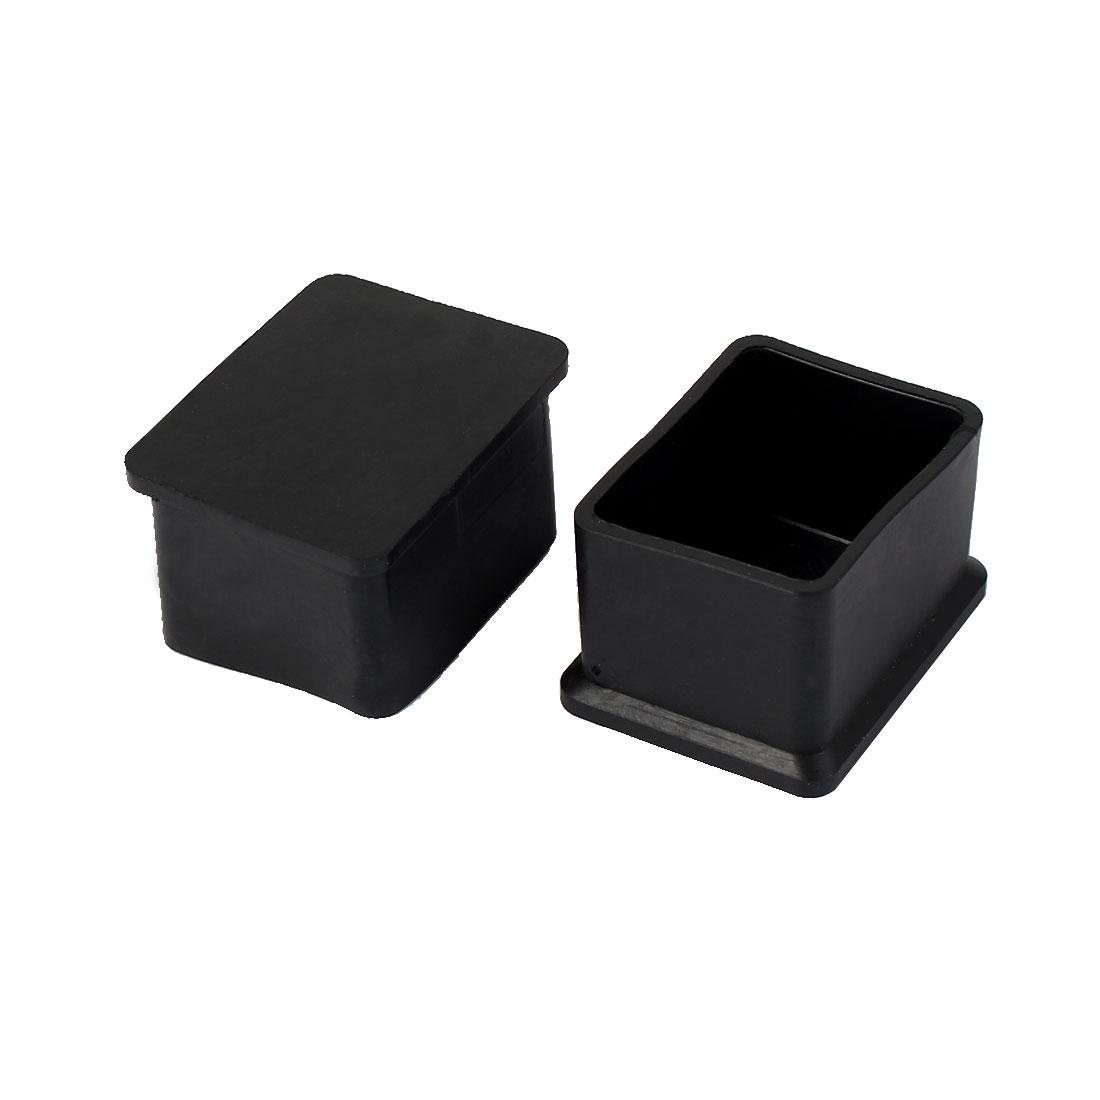 40mm x 30mm Square Shaped Furniture Table Chair Leg Foot Covers Cap Black 2 Pcs